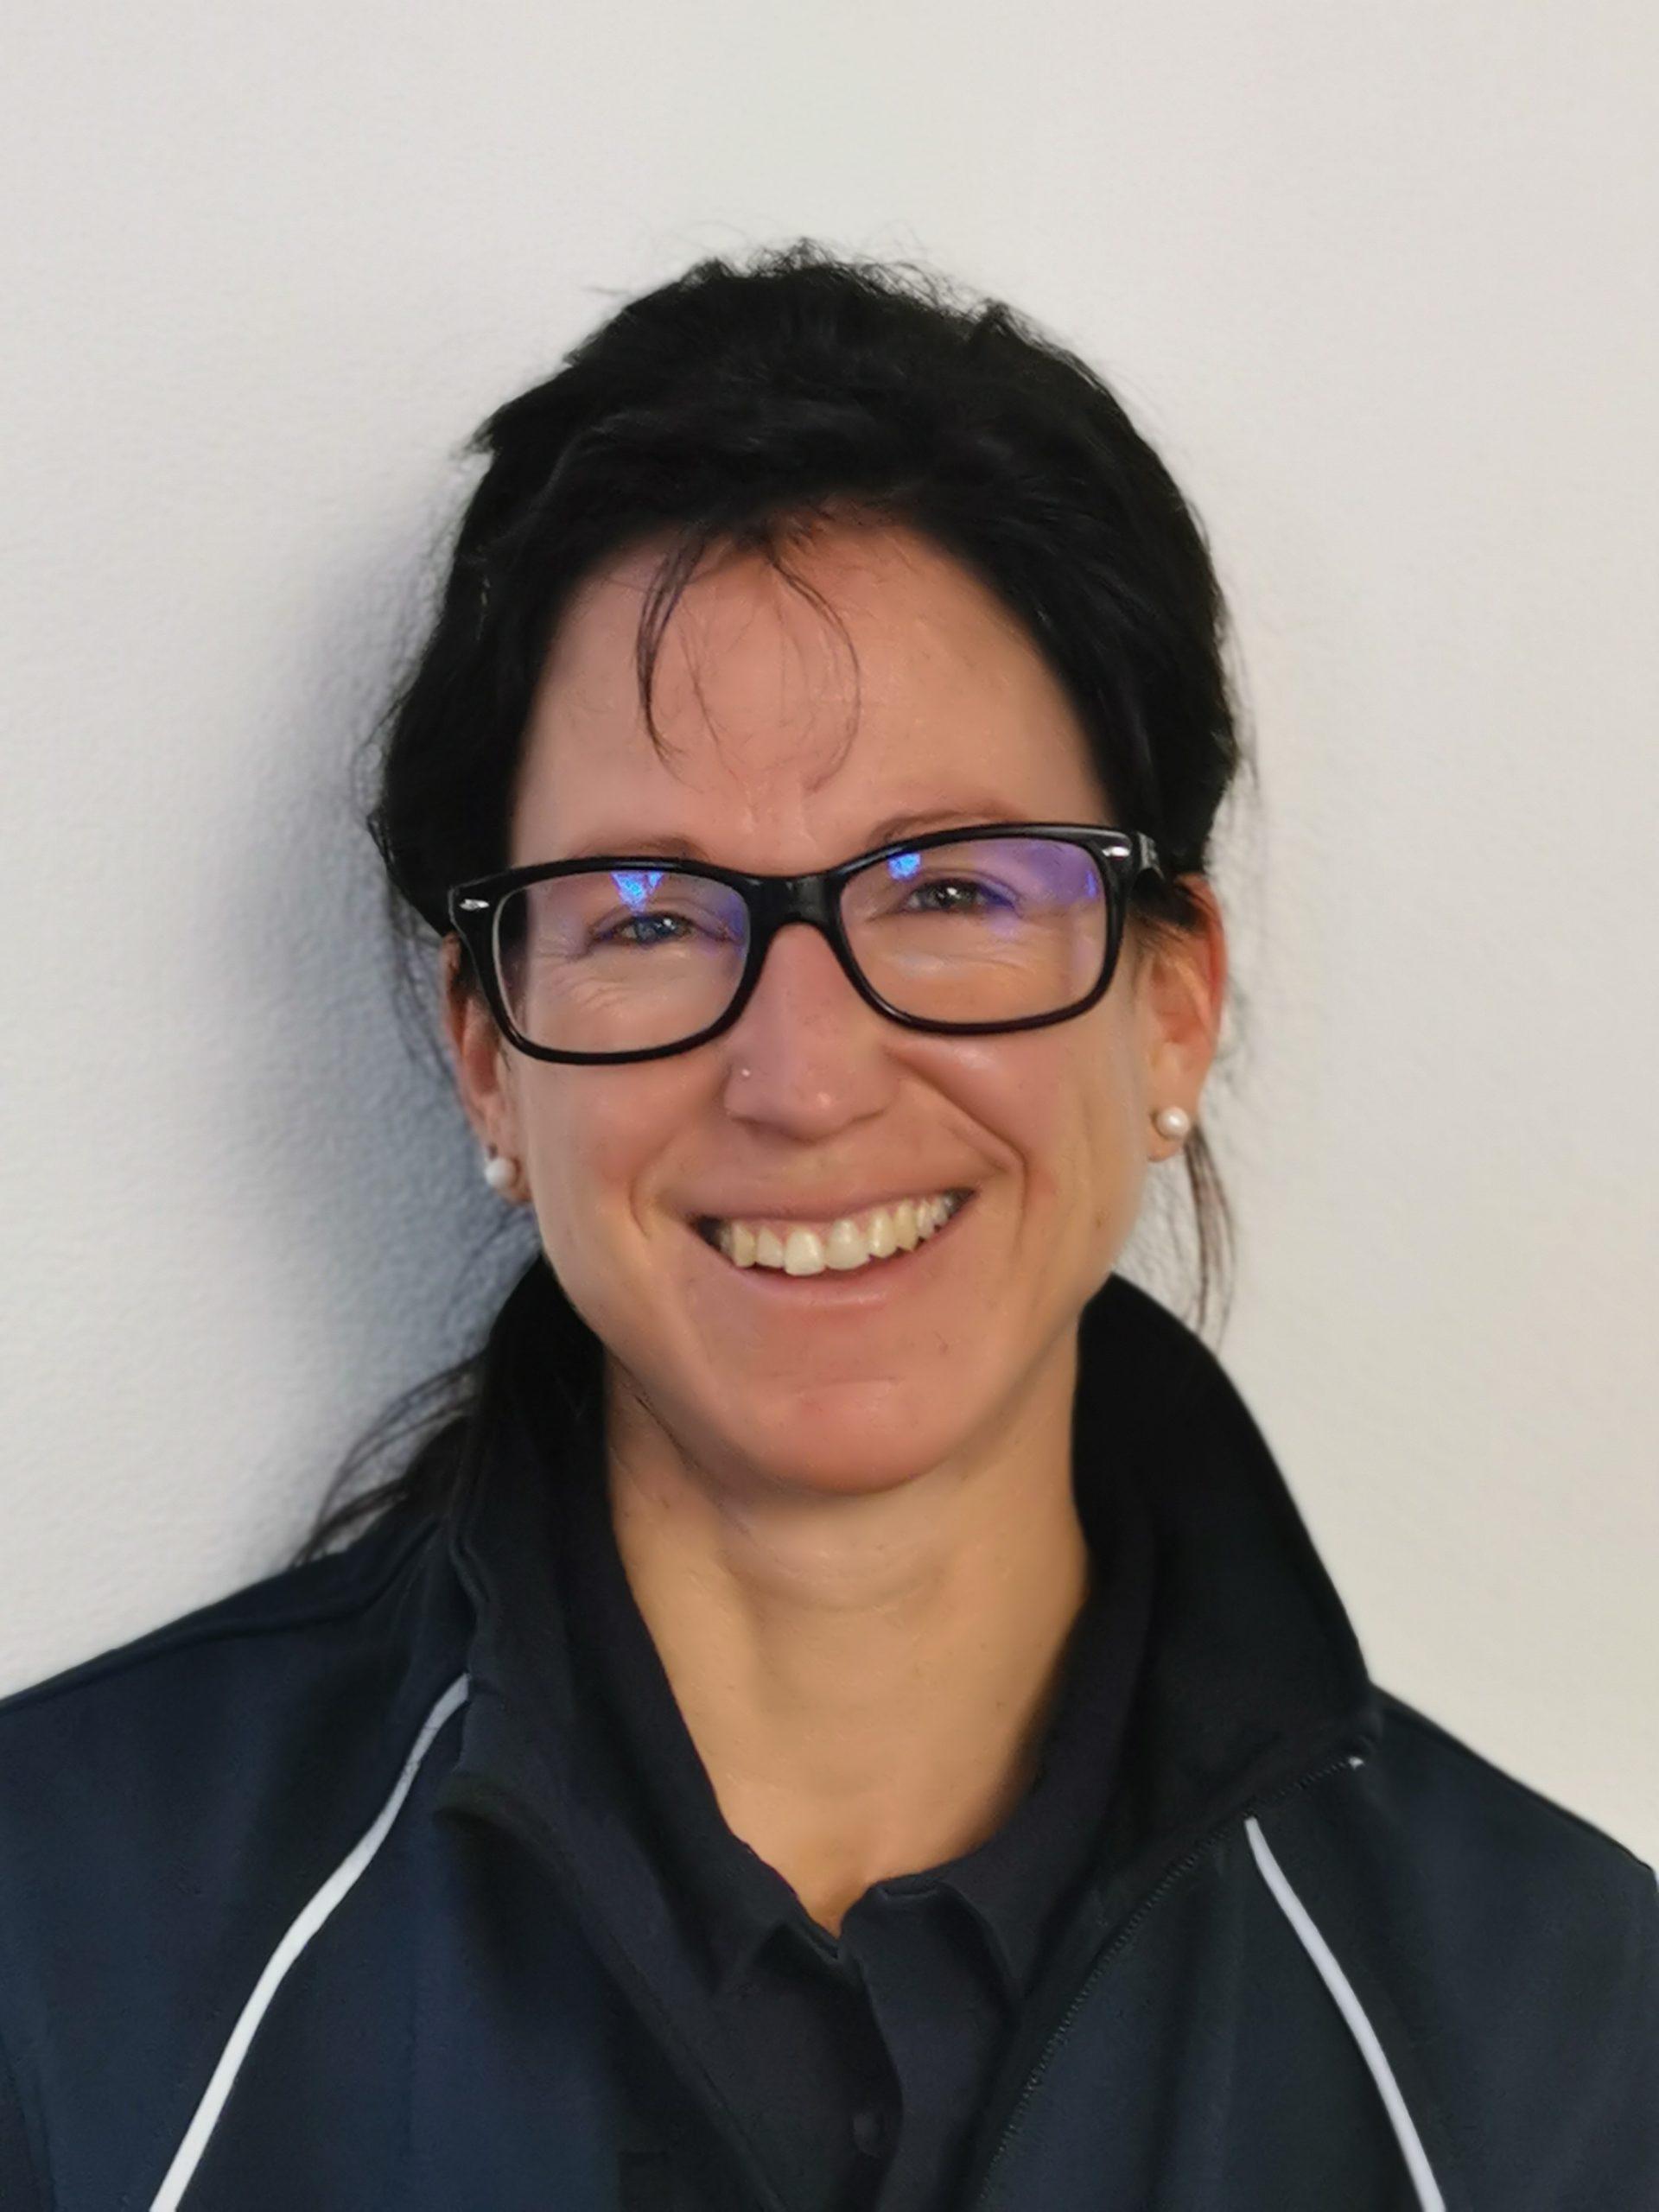 Karin Marxer